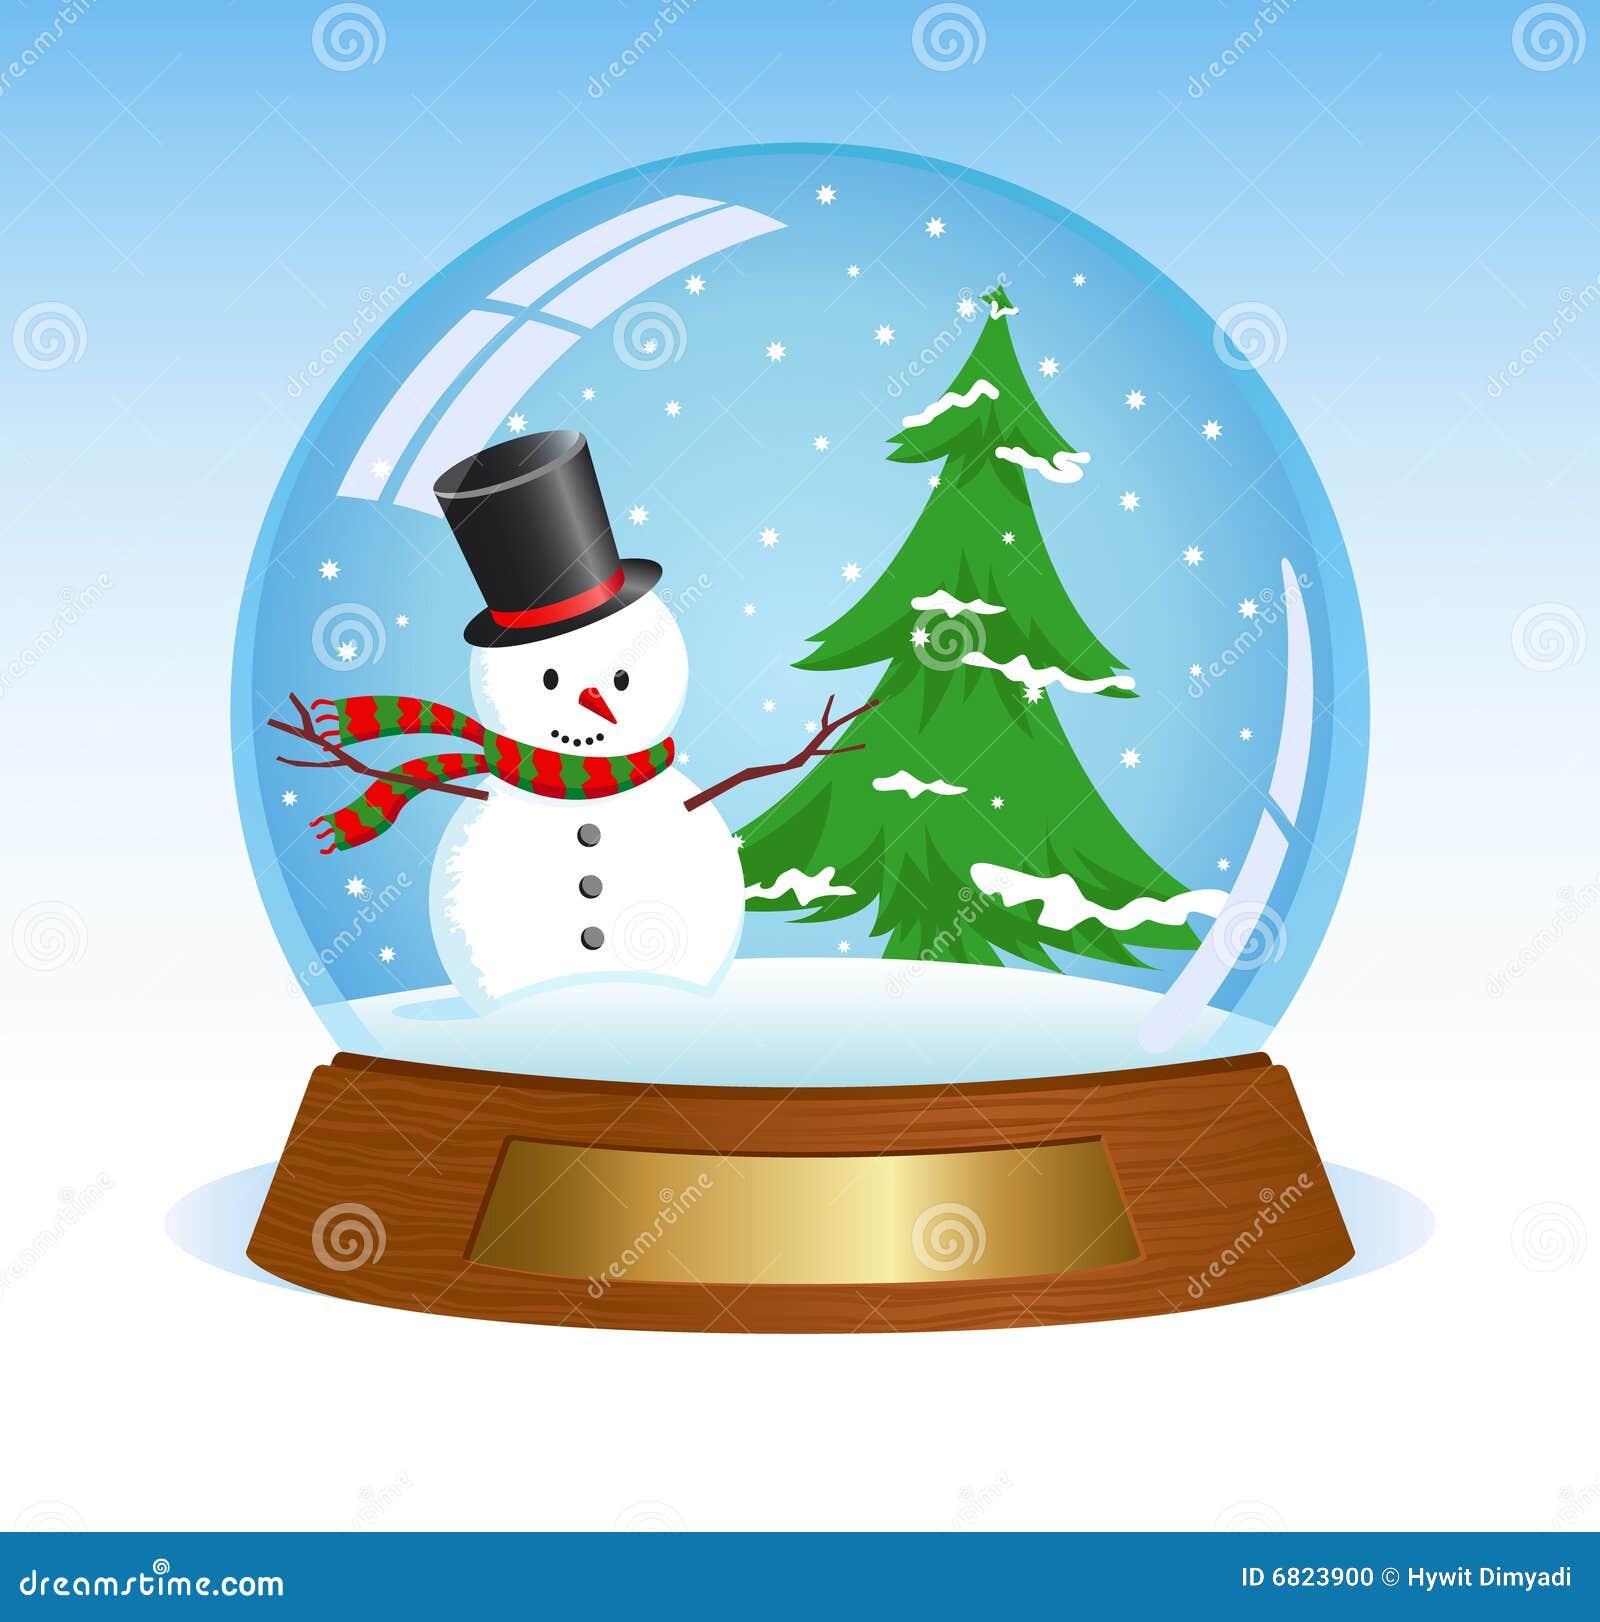 free clipart snow globe - photo #32